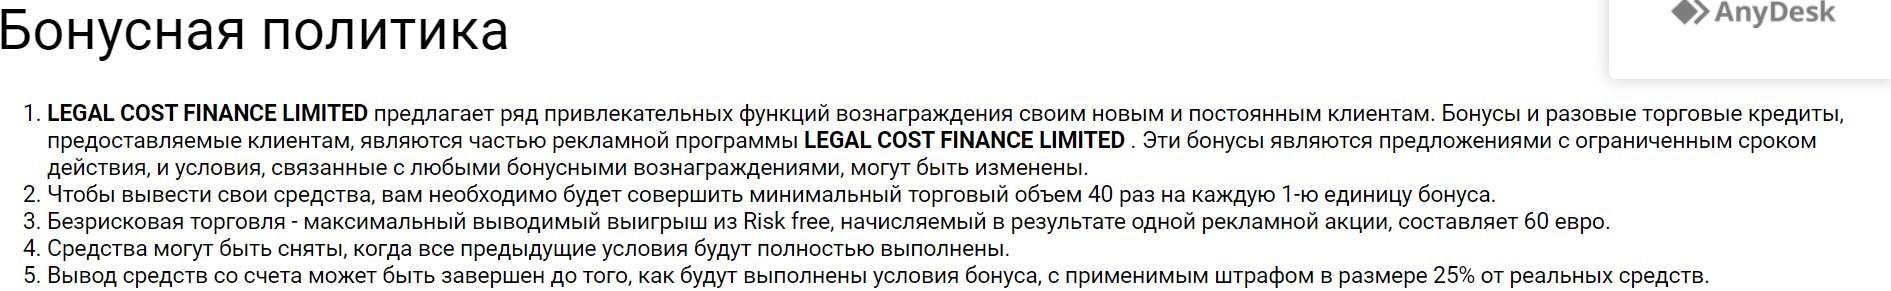 Legal Cost Finance Limited: отзывы трейдеров, условия сотрудничества